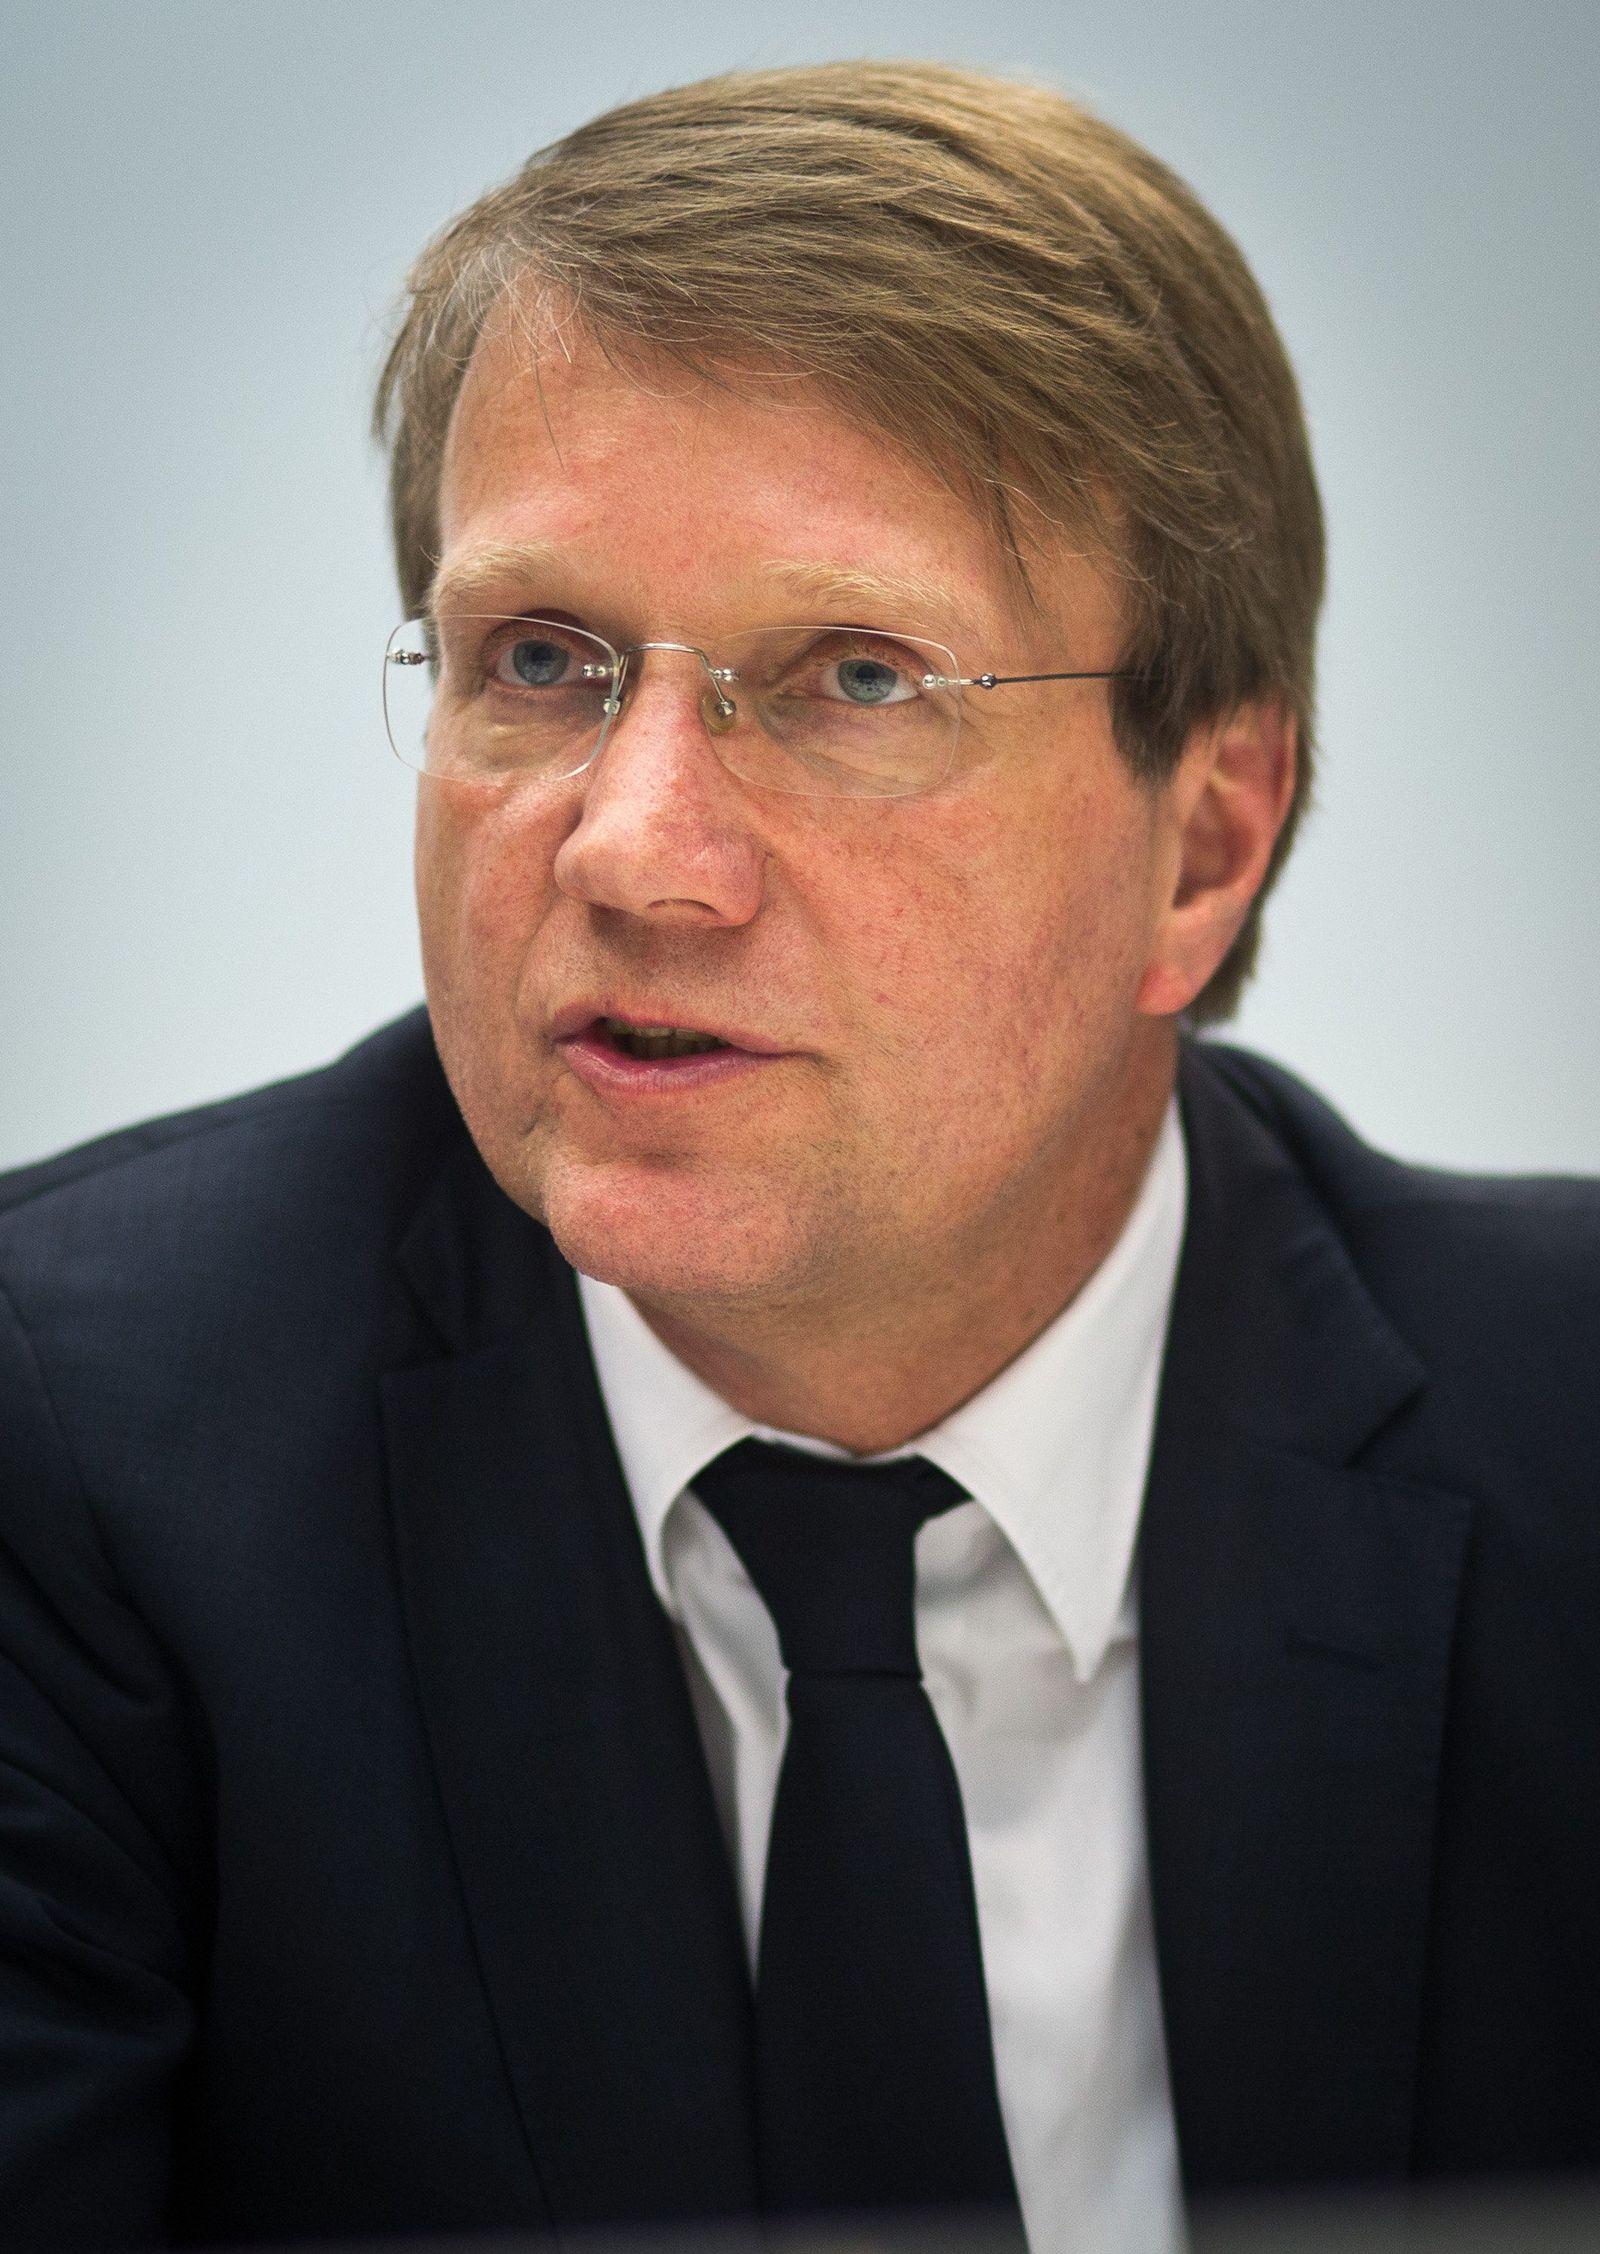 Ronald Pofalla